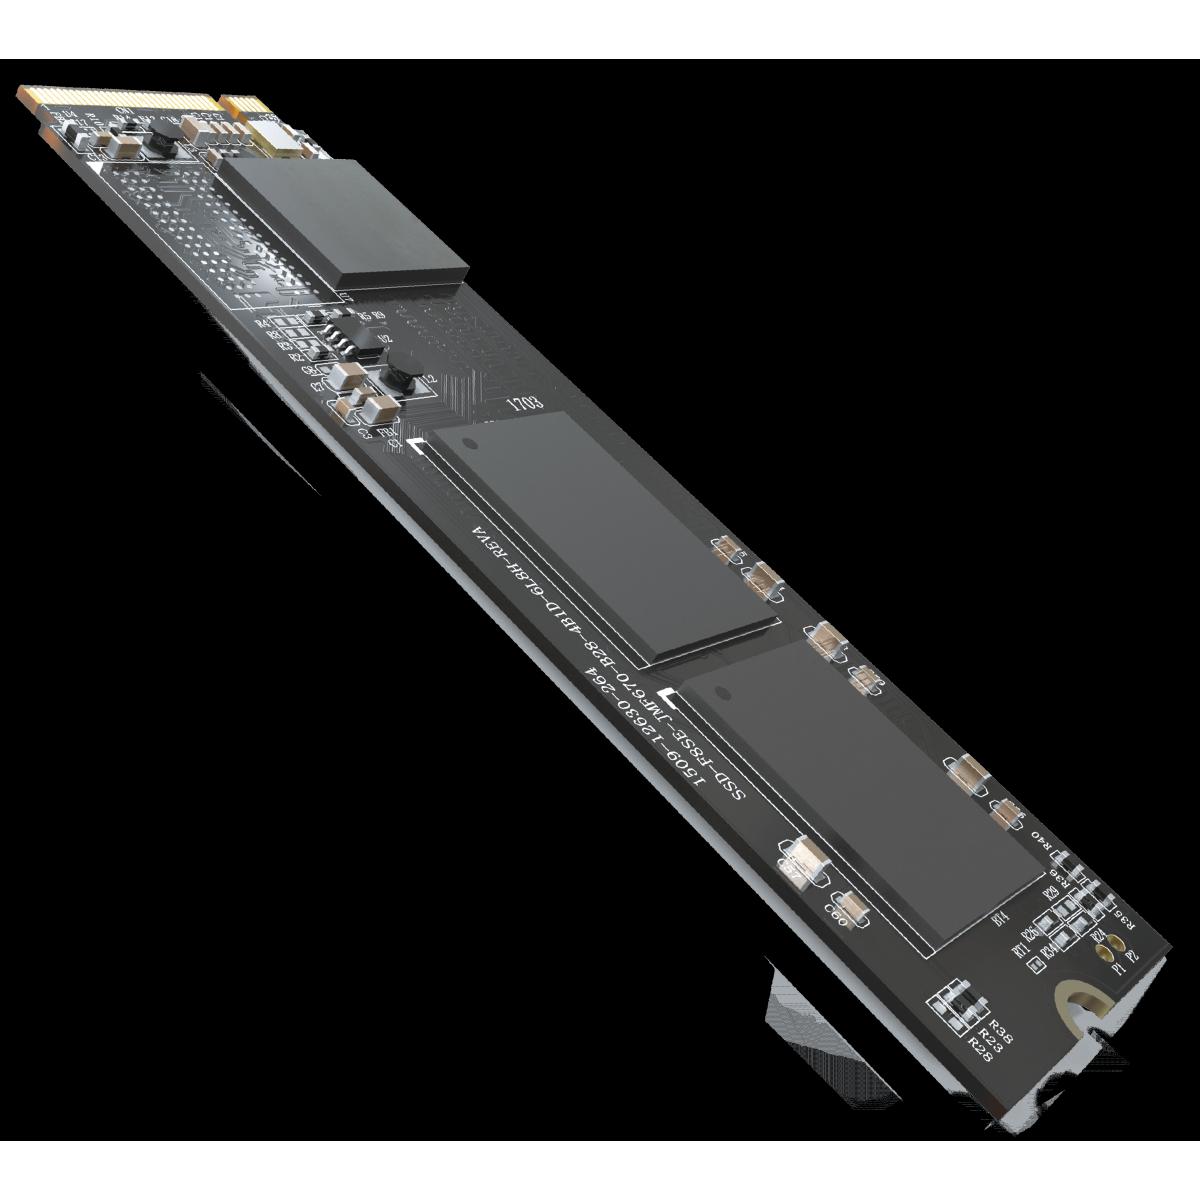 SSD Hikvision Minder, 512GB, M.2 NVMe, Leitura 2500MBs e Gravação 2100MBs, HS-SSD-Minder(P)/512G